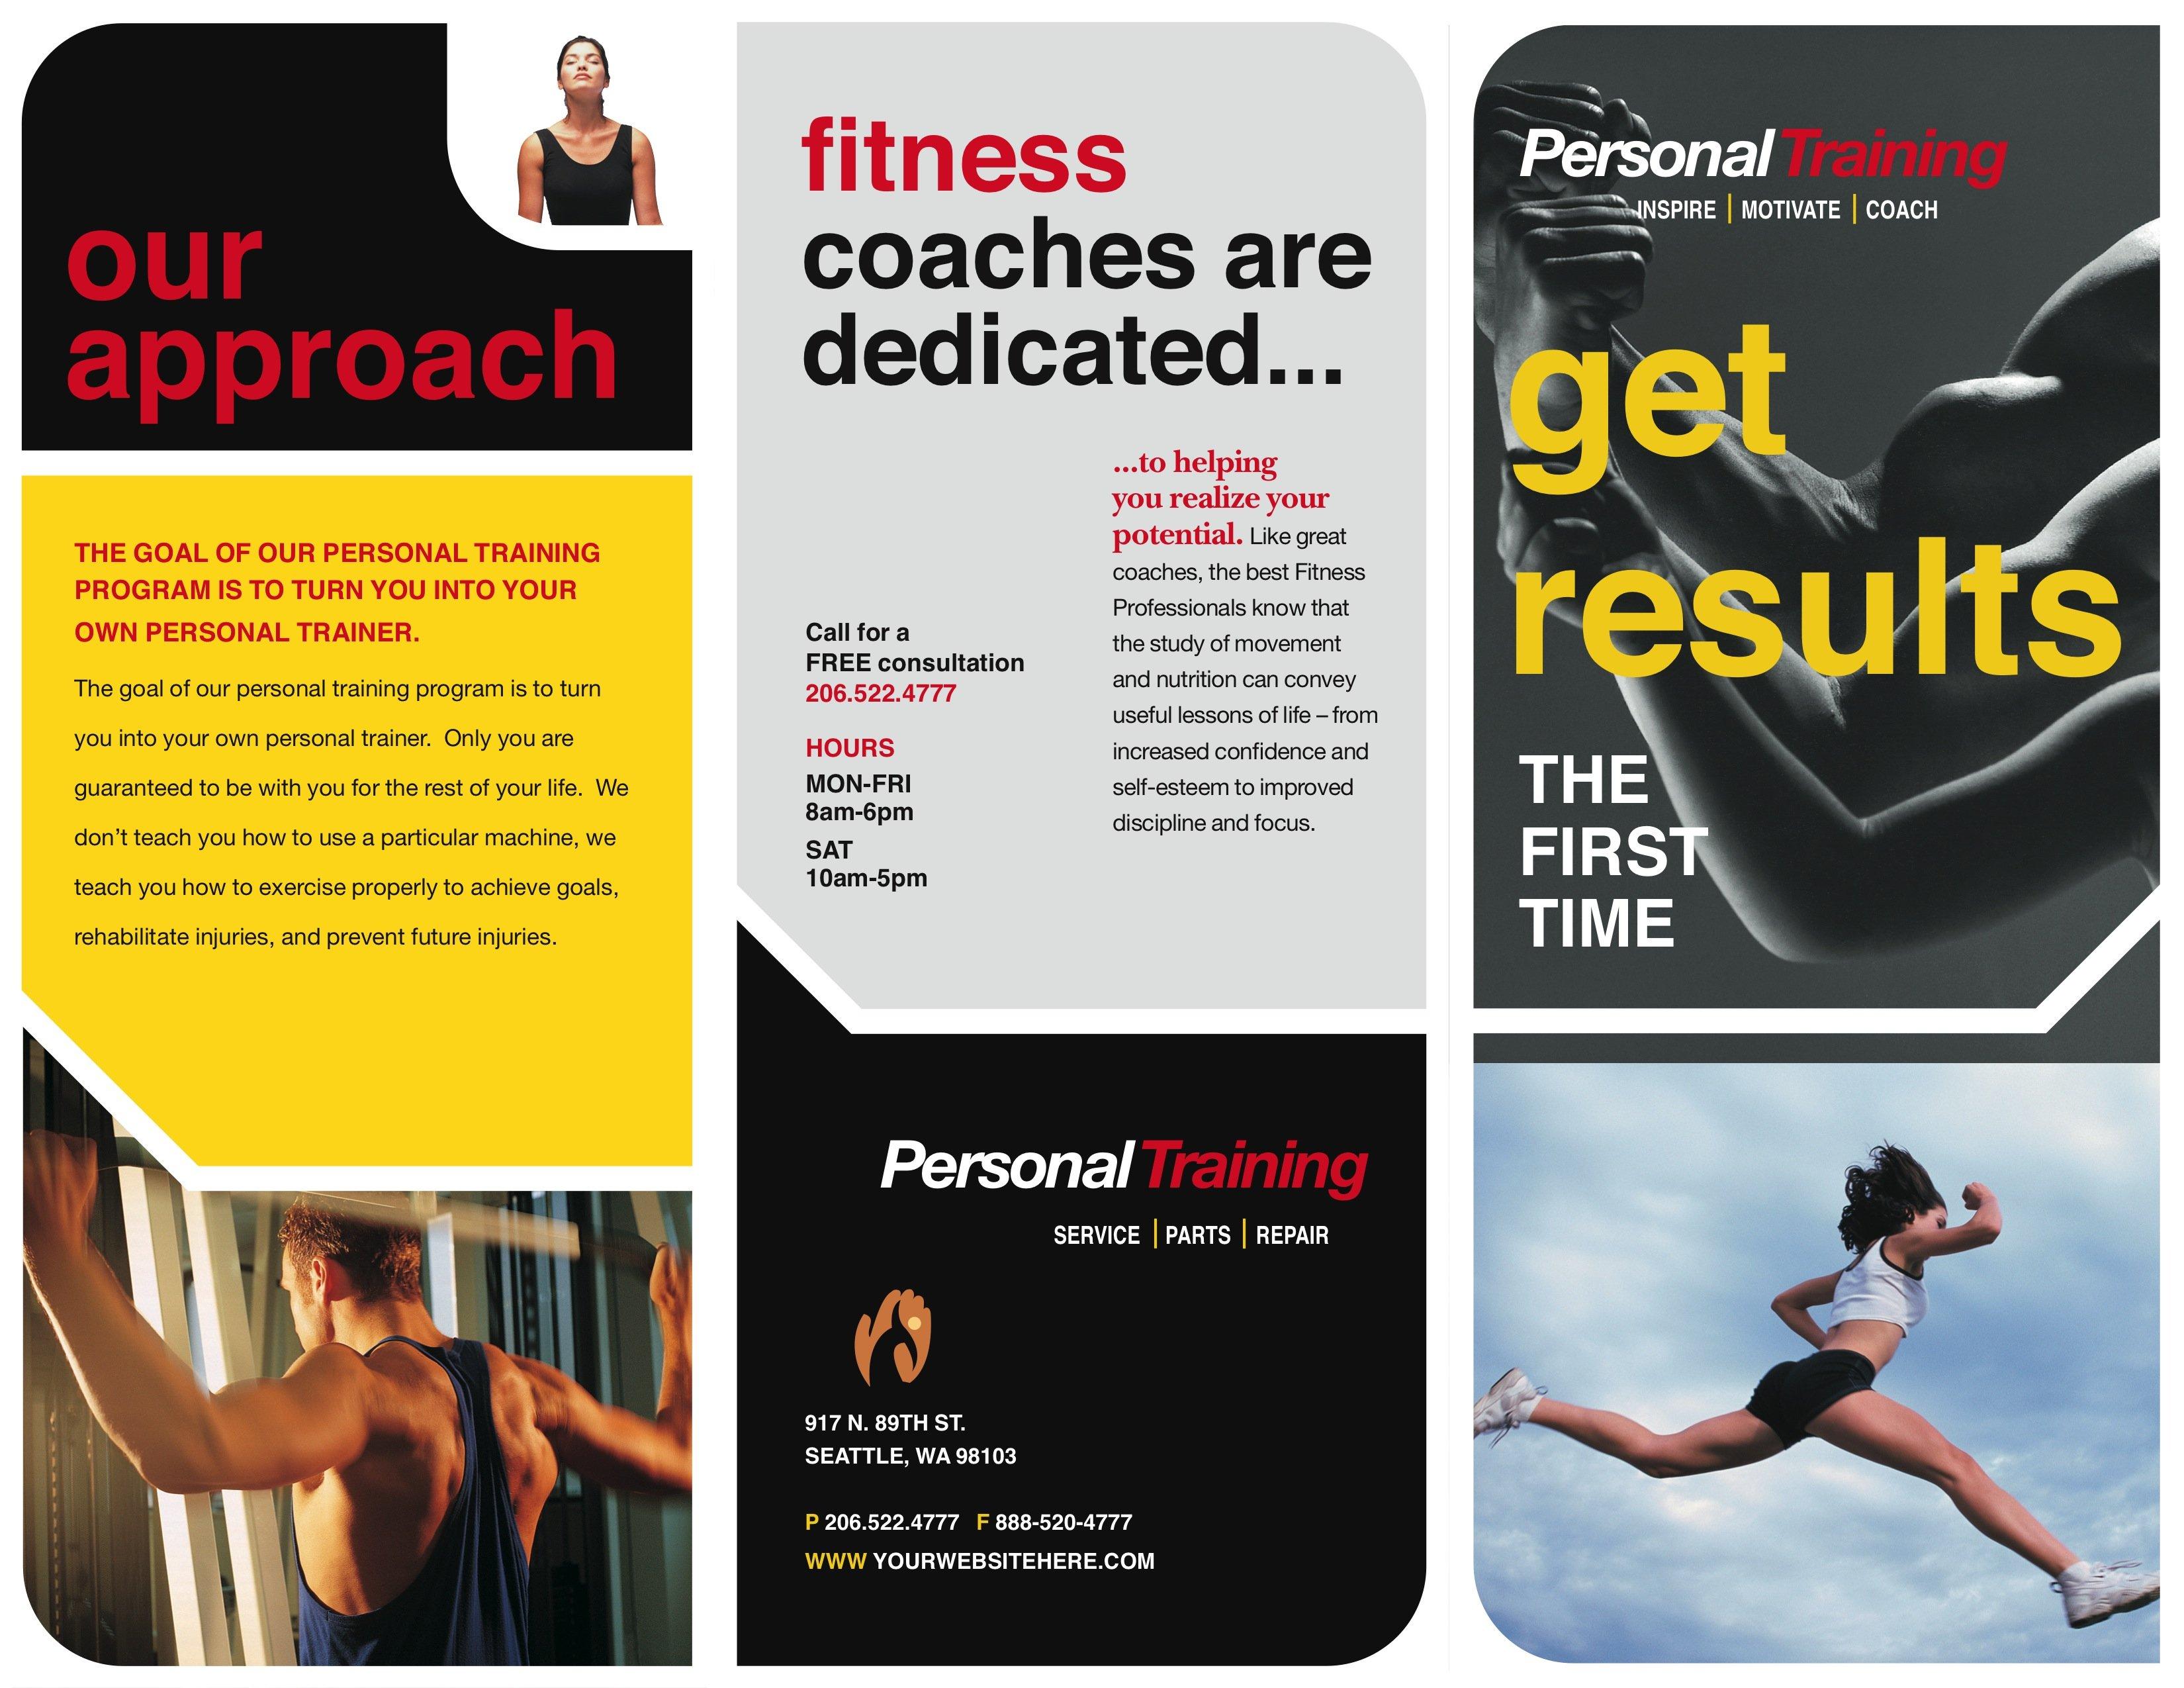 Personal trainer intensity brochure a printer for gyms and personal trainer intensity brochure a printer for gyms and personal trainers colourmoves